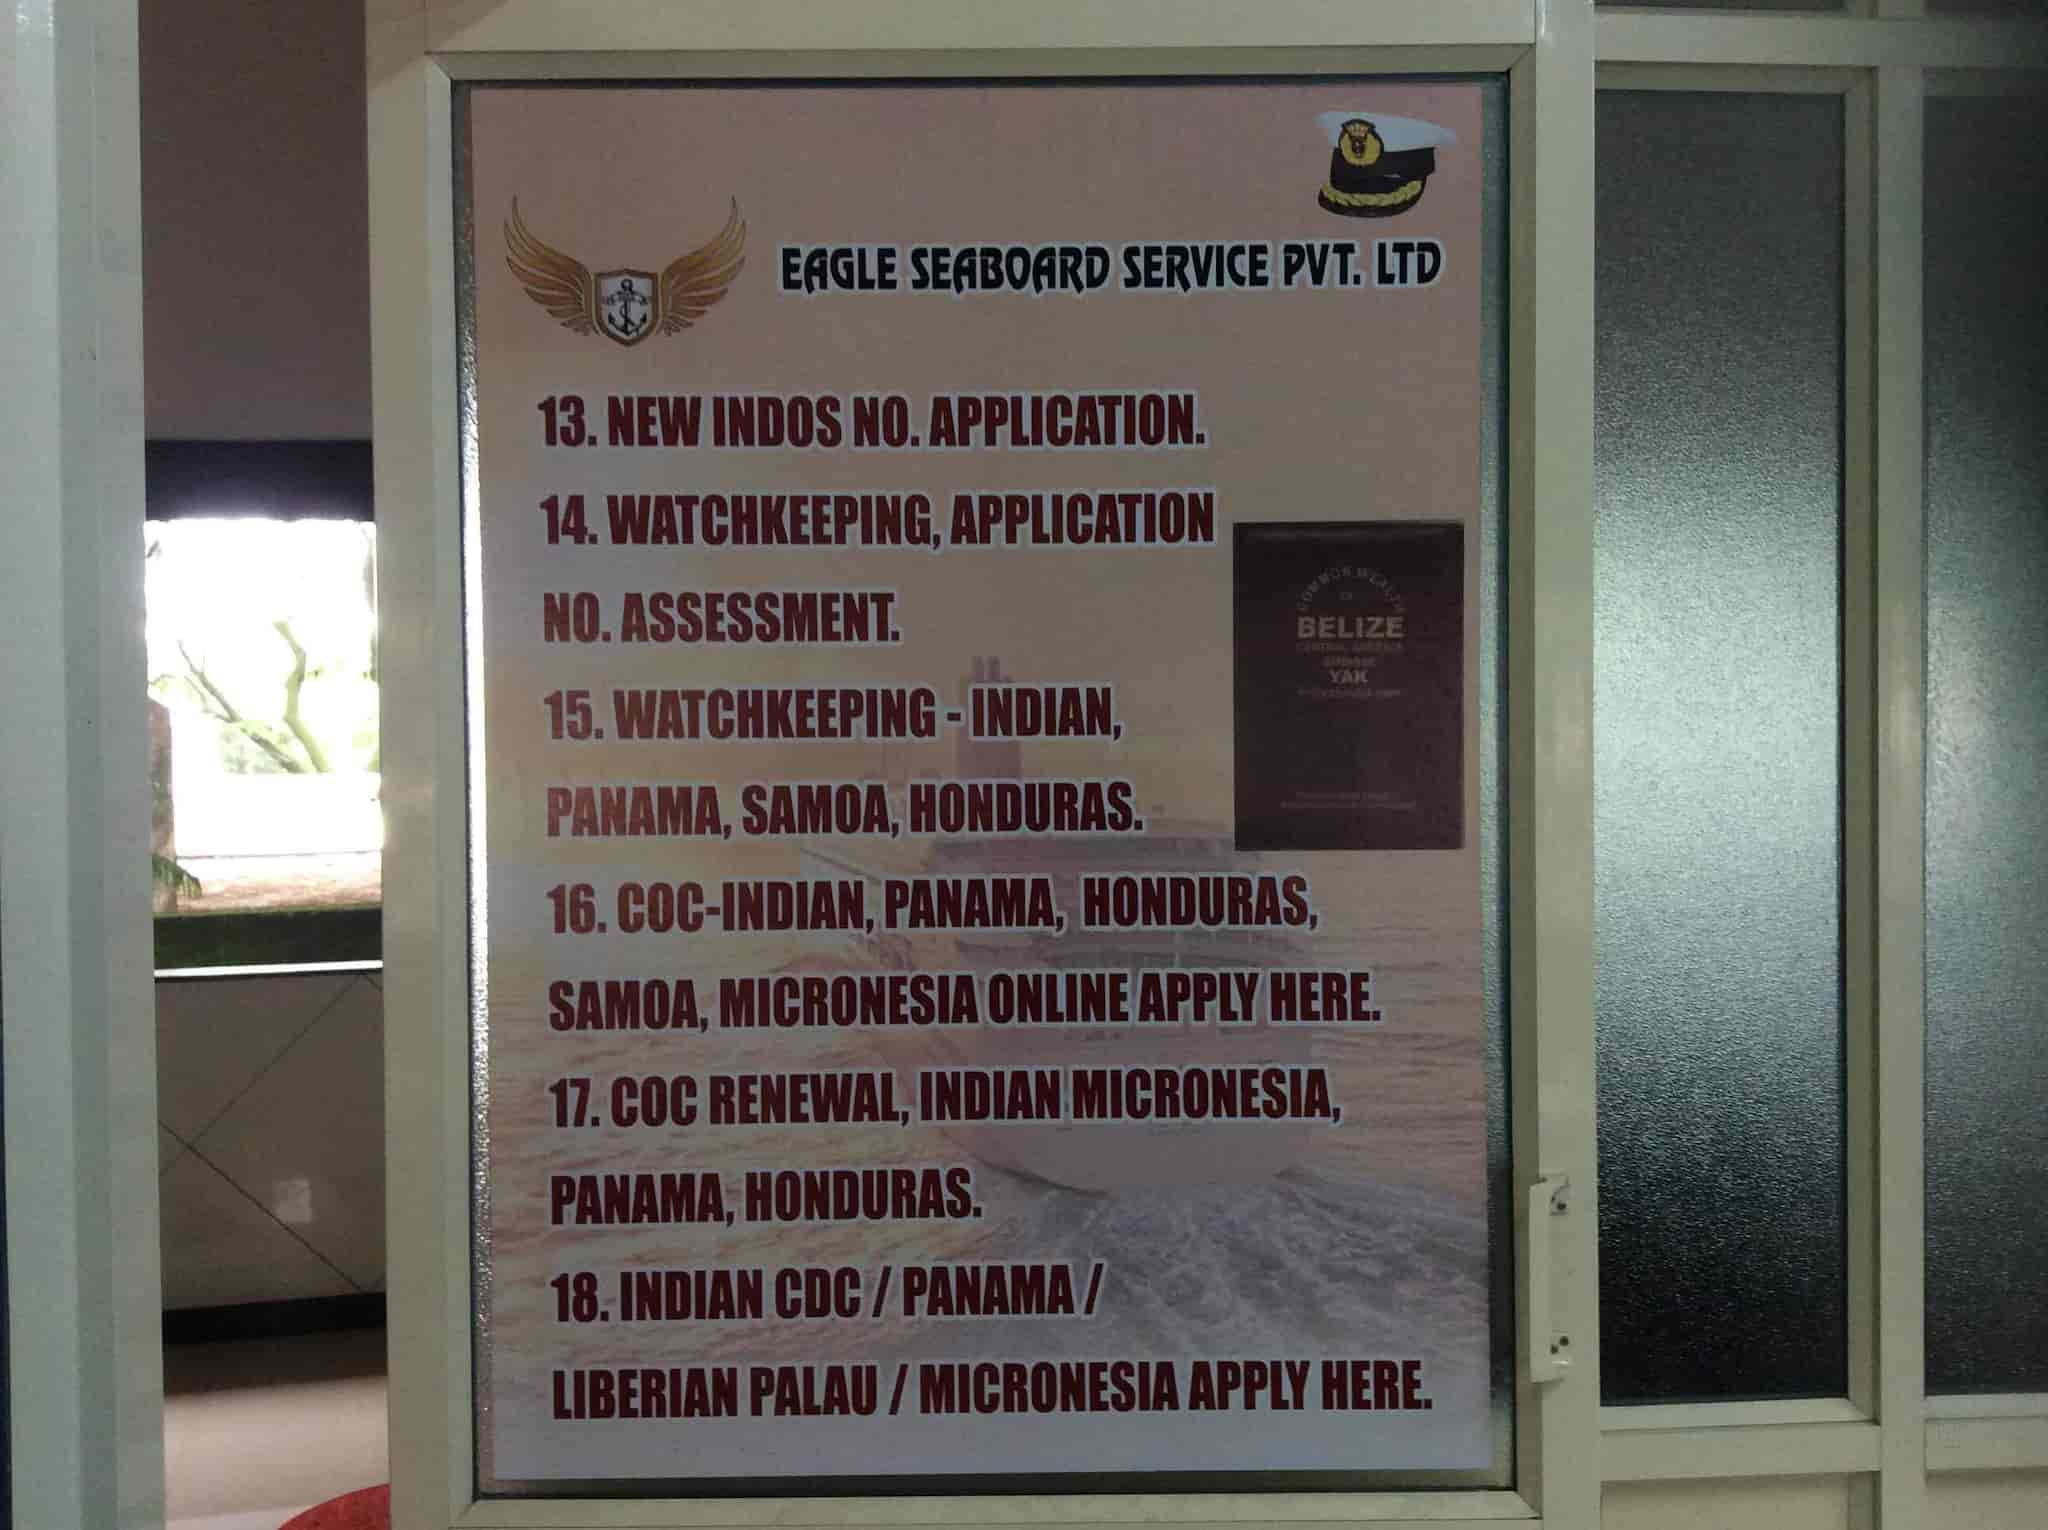 Eagle Seaboard Service Pvtltd Photos, Hindwadi Belgaum, Belgaum